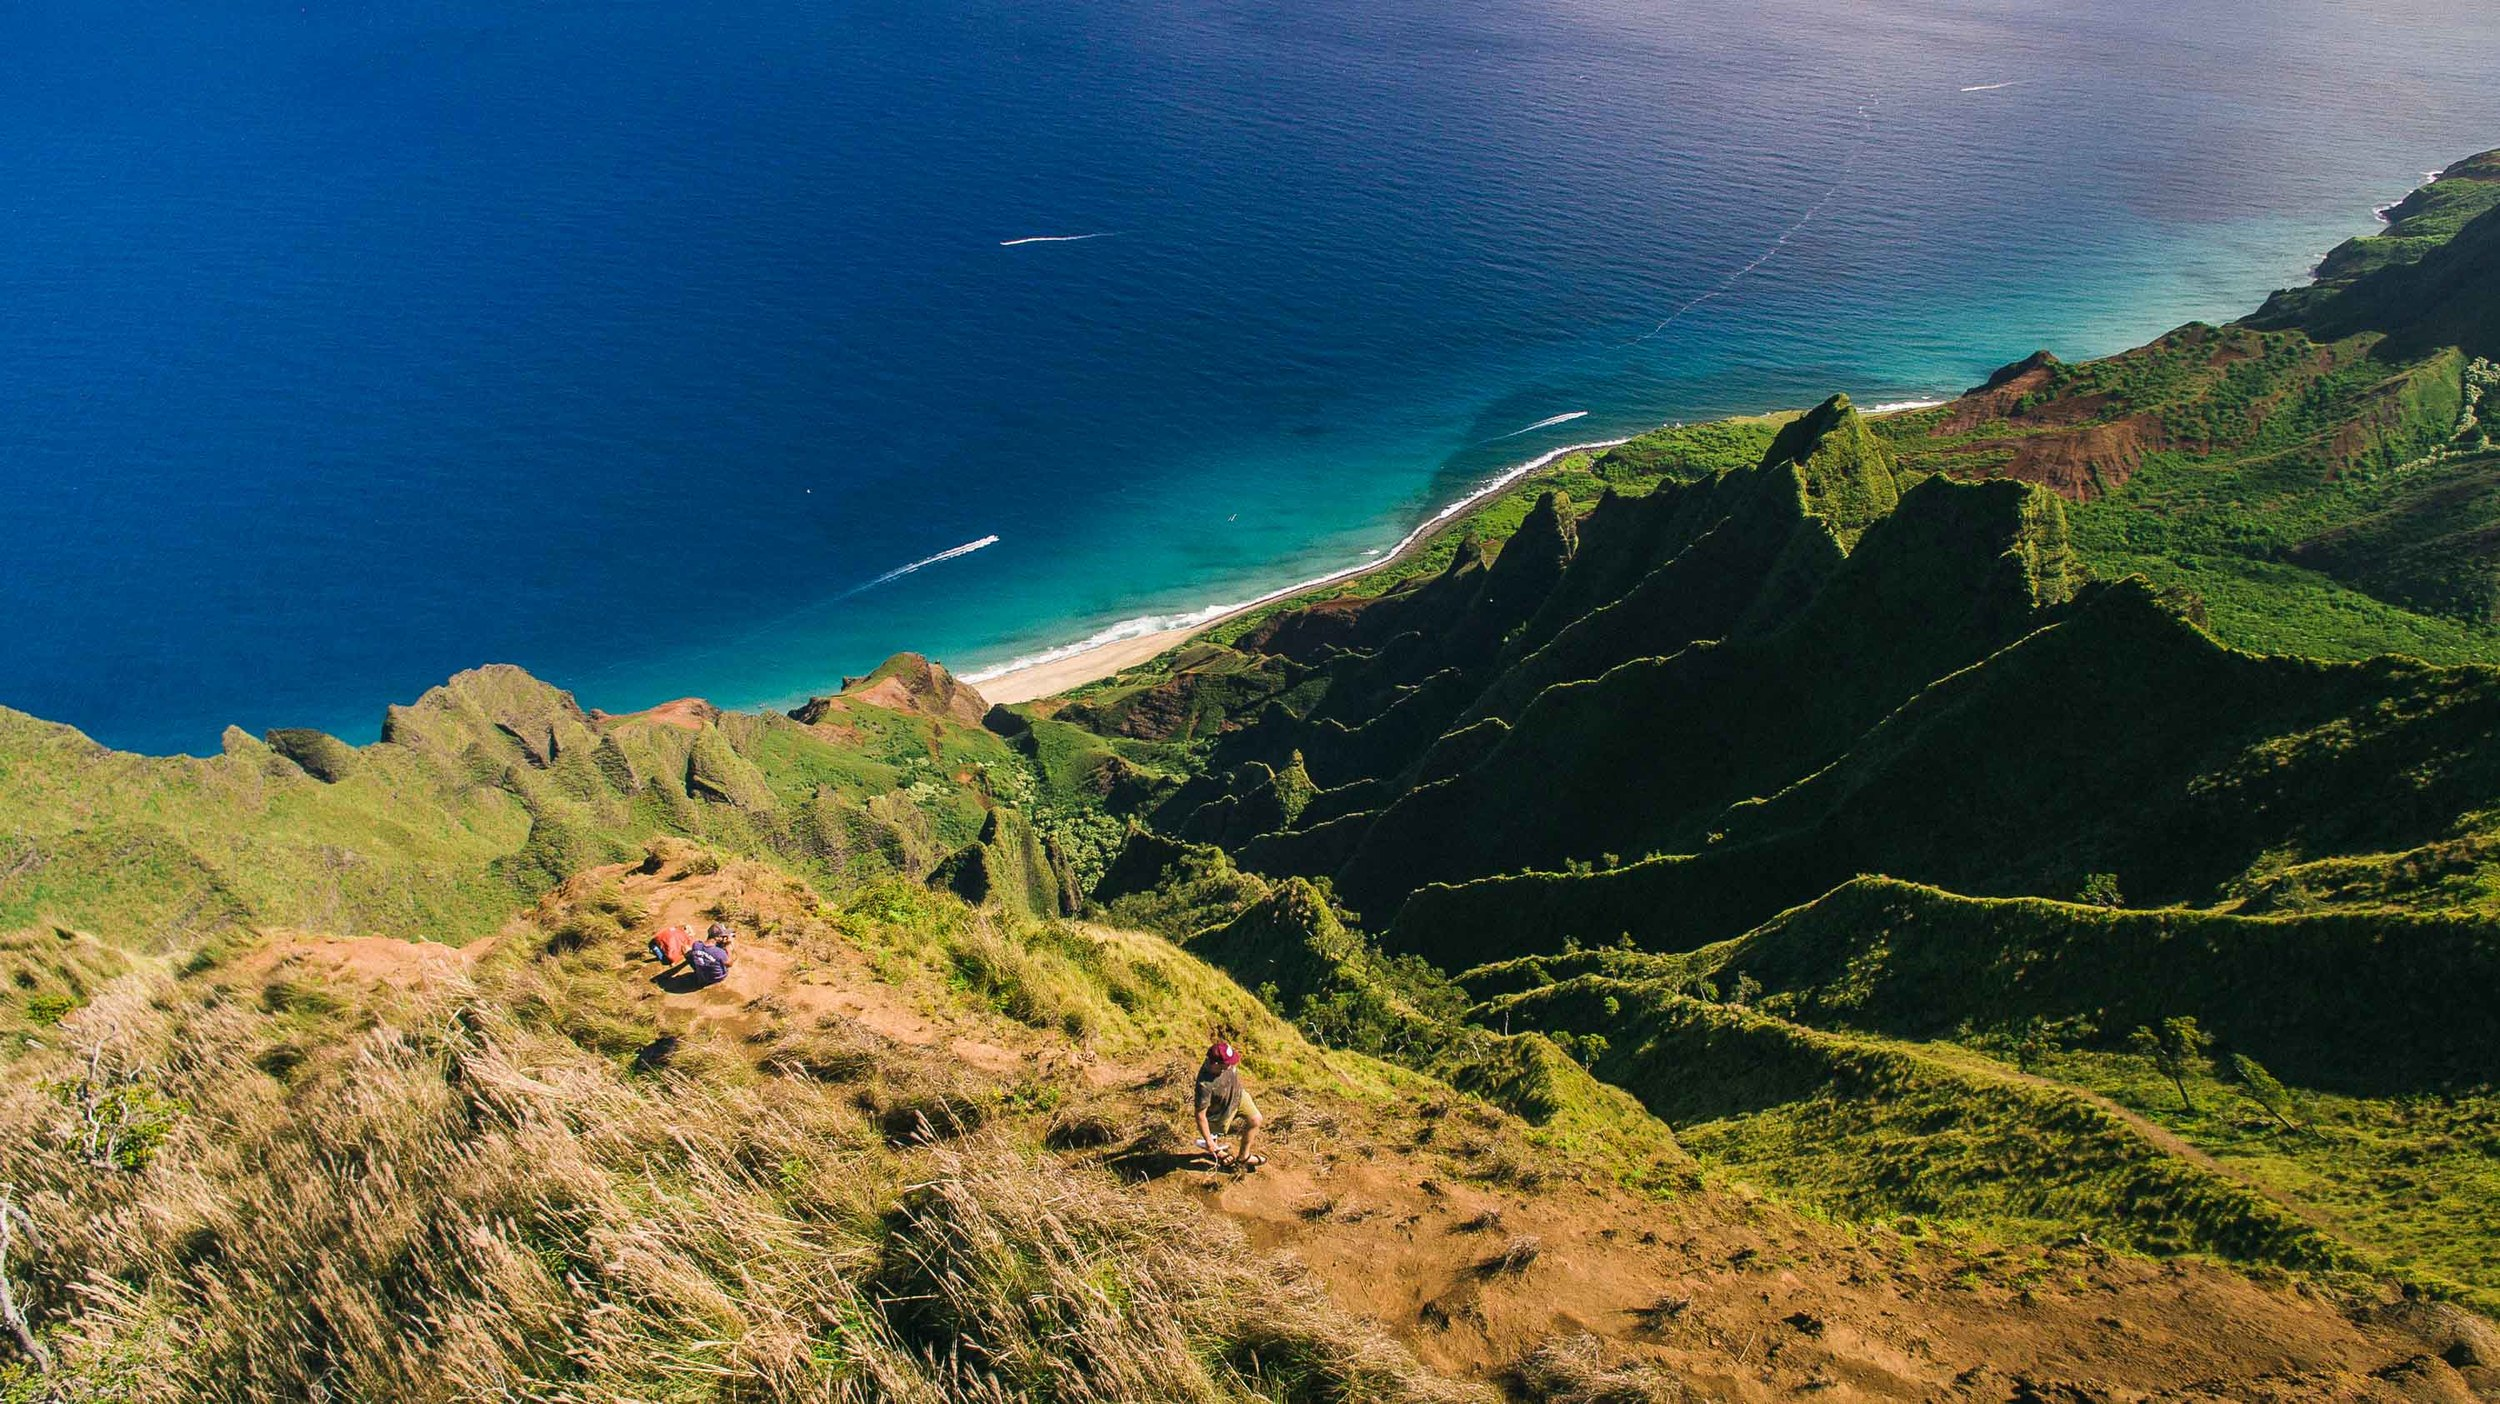 bryce-johnson-kalalau-ridge-kauai-hiking-hammock-palmwood-aloha-exchange-12.jpg